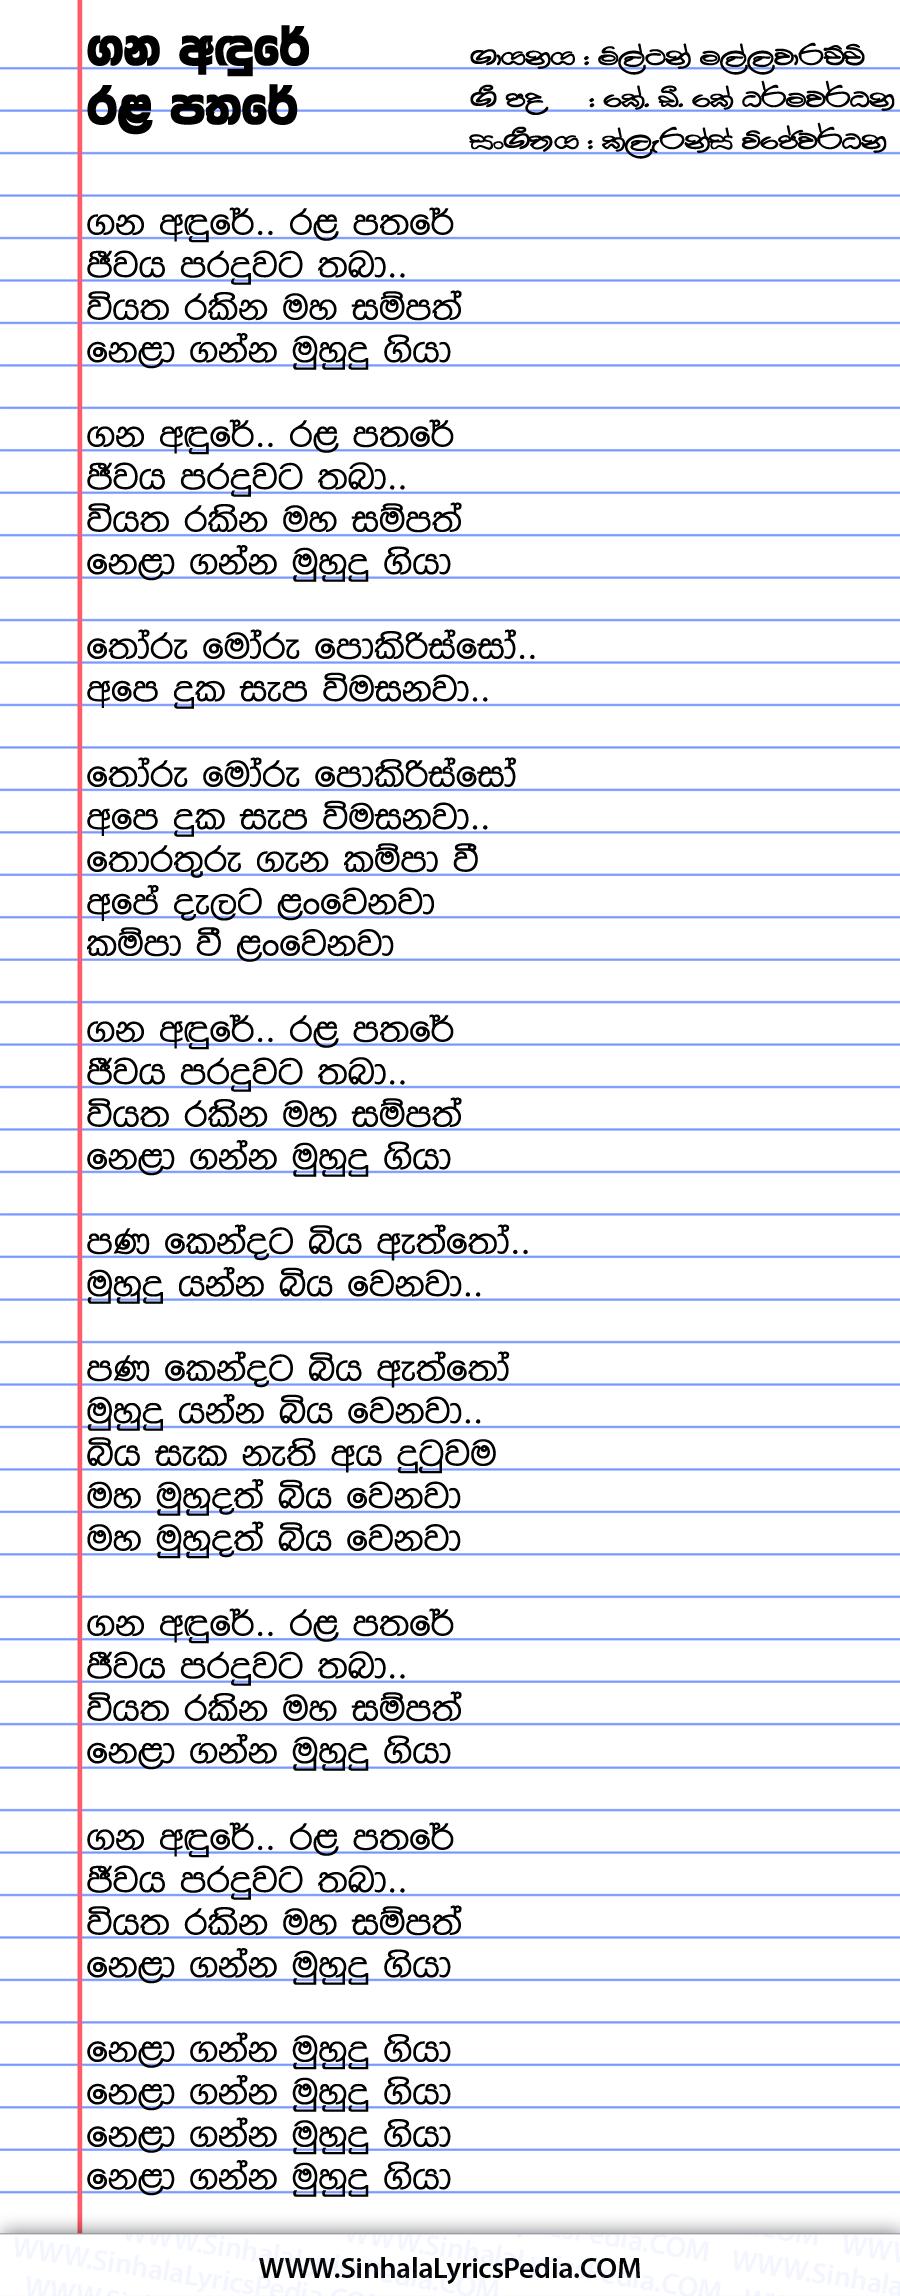 Gana Adure Rala Pathare Jeewaya Paraduwata Thaba Song Lyrics